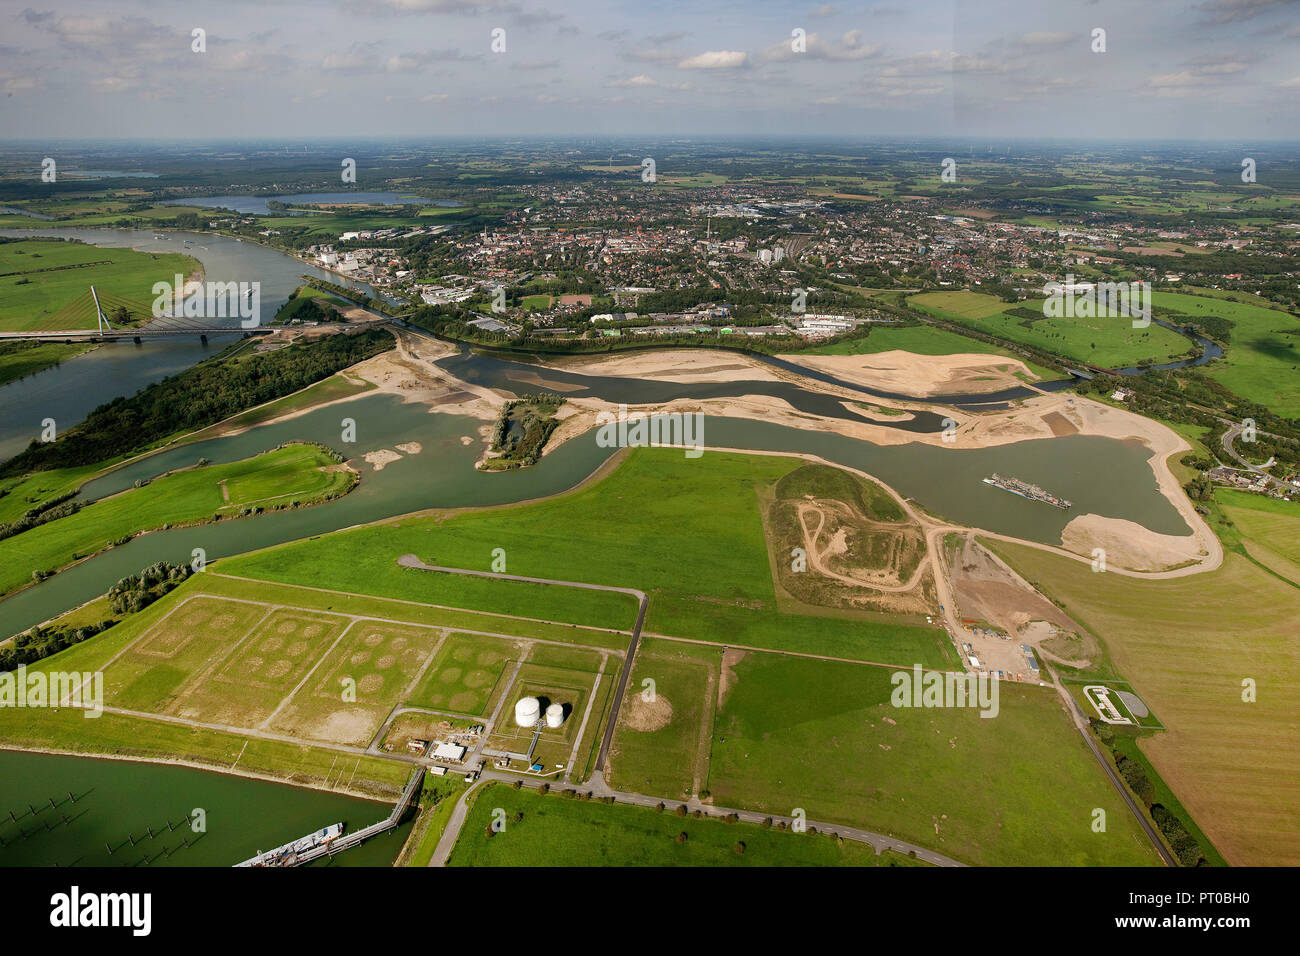 Aerial view, Lippe, Lippe mouth, reconstruction, renewal, meander, Wesel port, Rhine, Rhine bridge, Wesel, Ruhr area, Lower Rhine, North Rhine-Westphalia, Germany, Europe - Stock Image